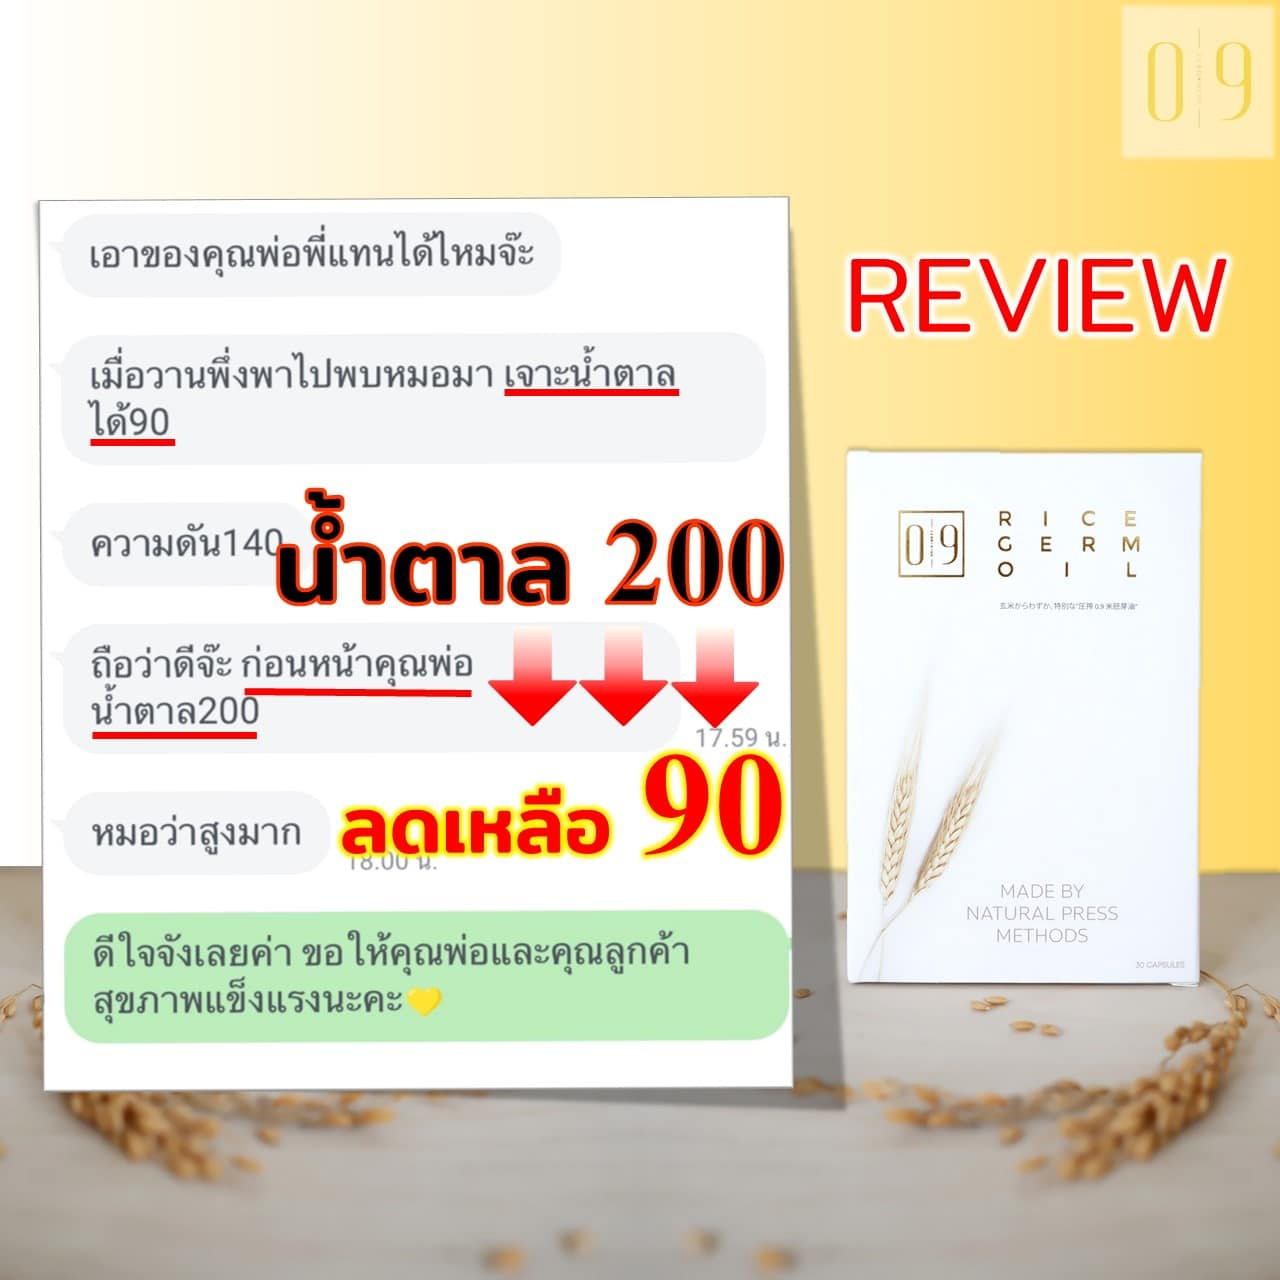 ReviewDiab